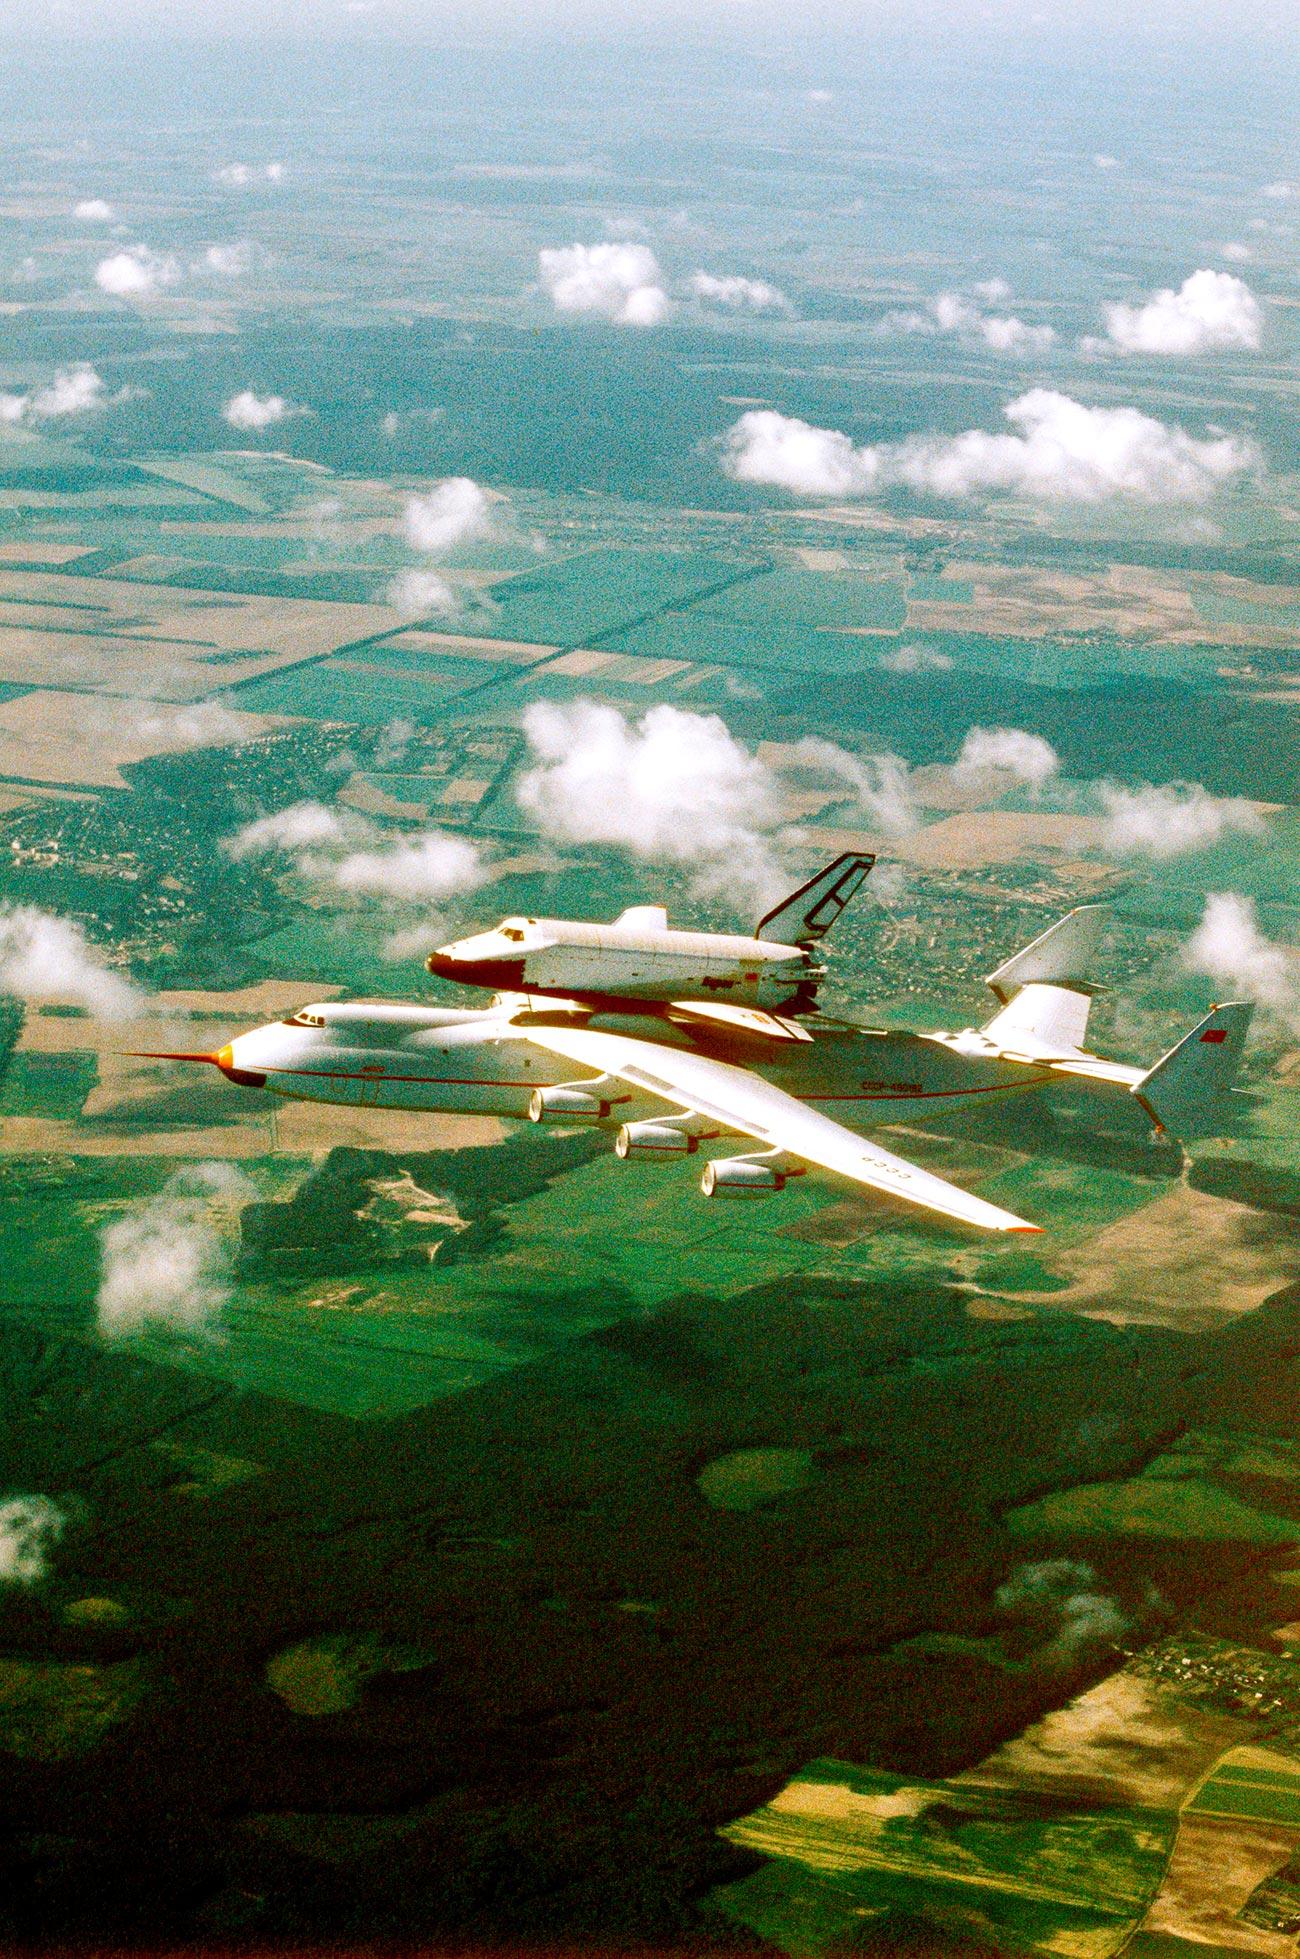 Pesawat An-225 Mriya mengangkut pesawat ulang-alik Buran pada 2006. Sumber: Igor Kostin/RIA Novosti